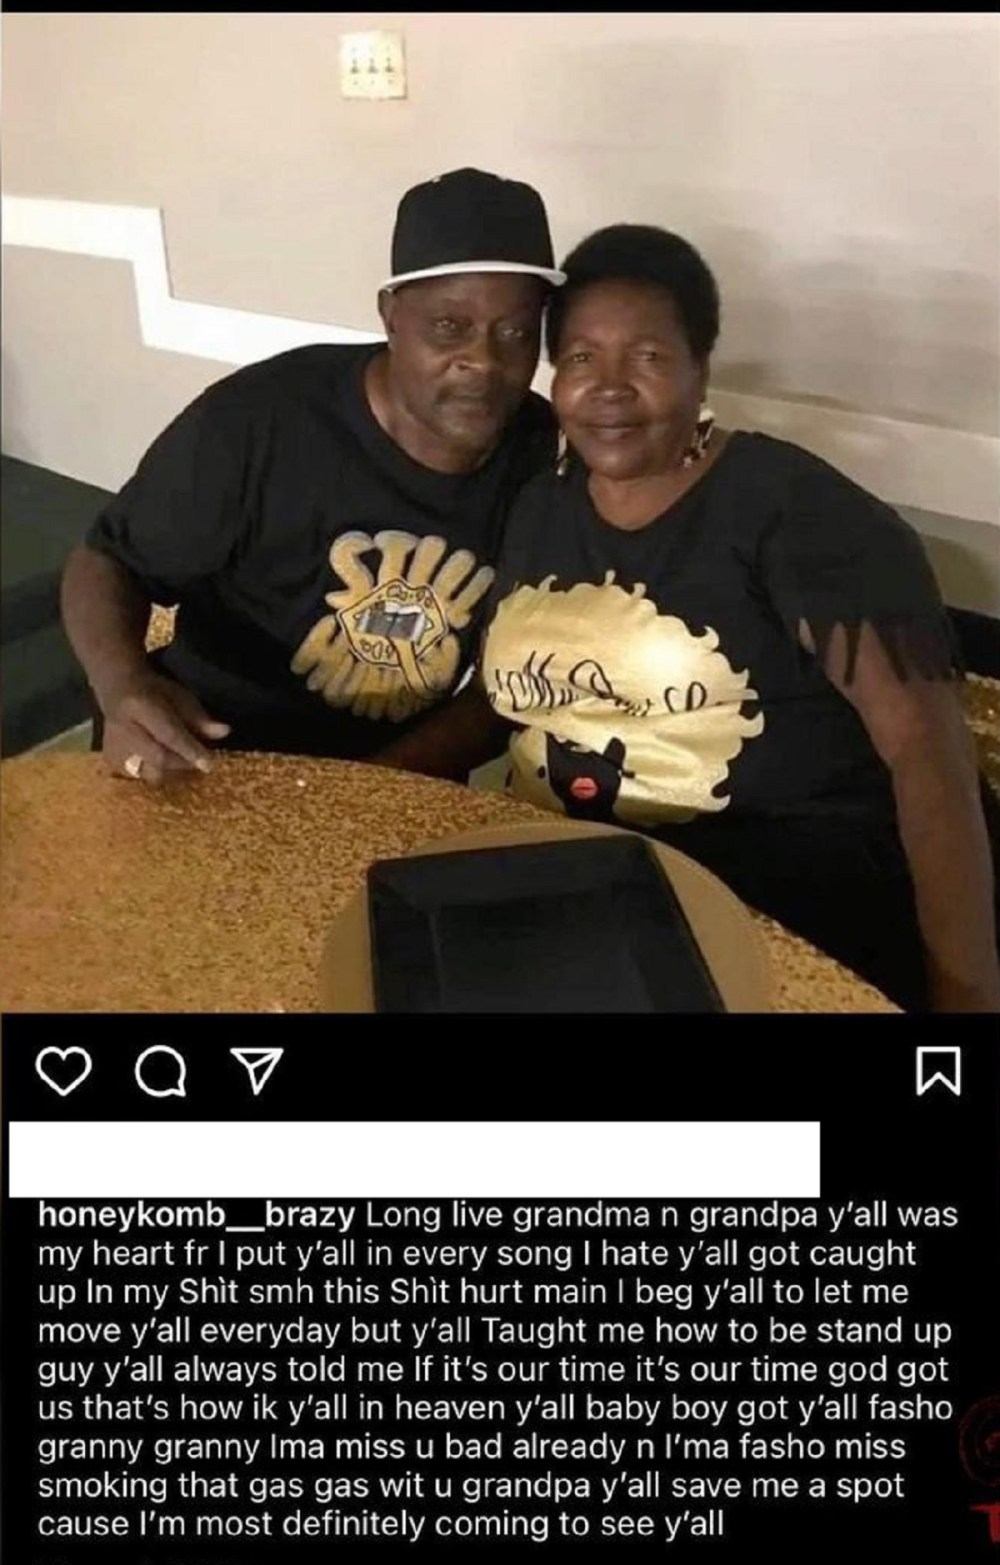 Honeykomb Brazy grandparents shot killed burned alive in home